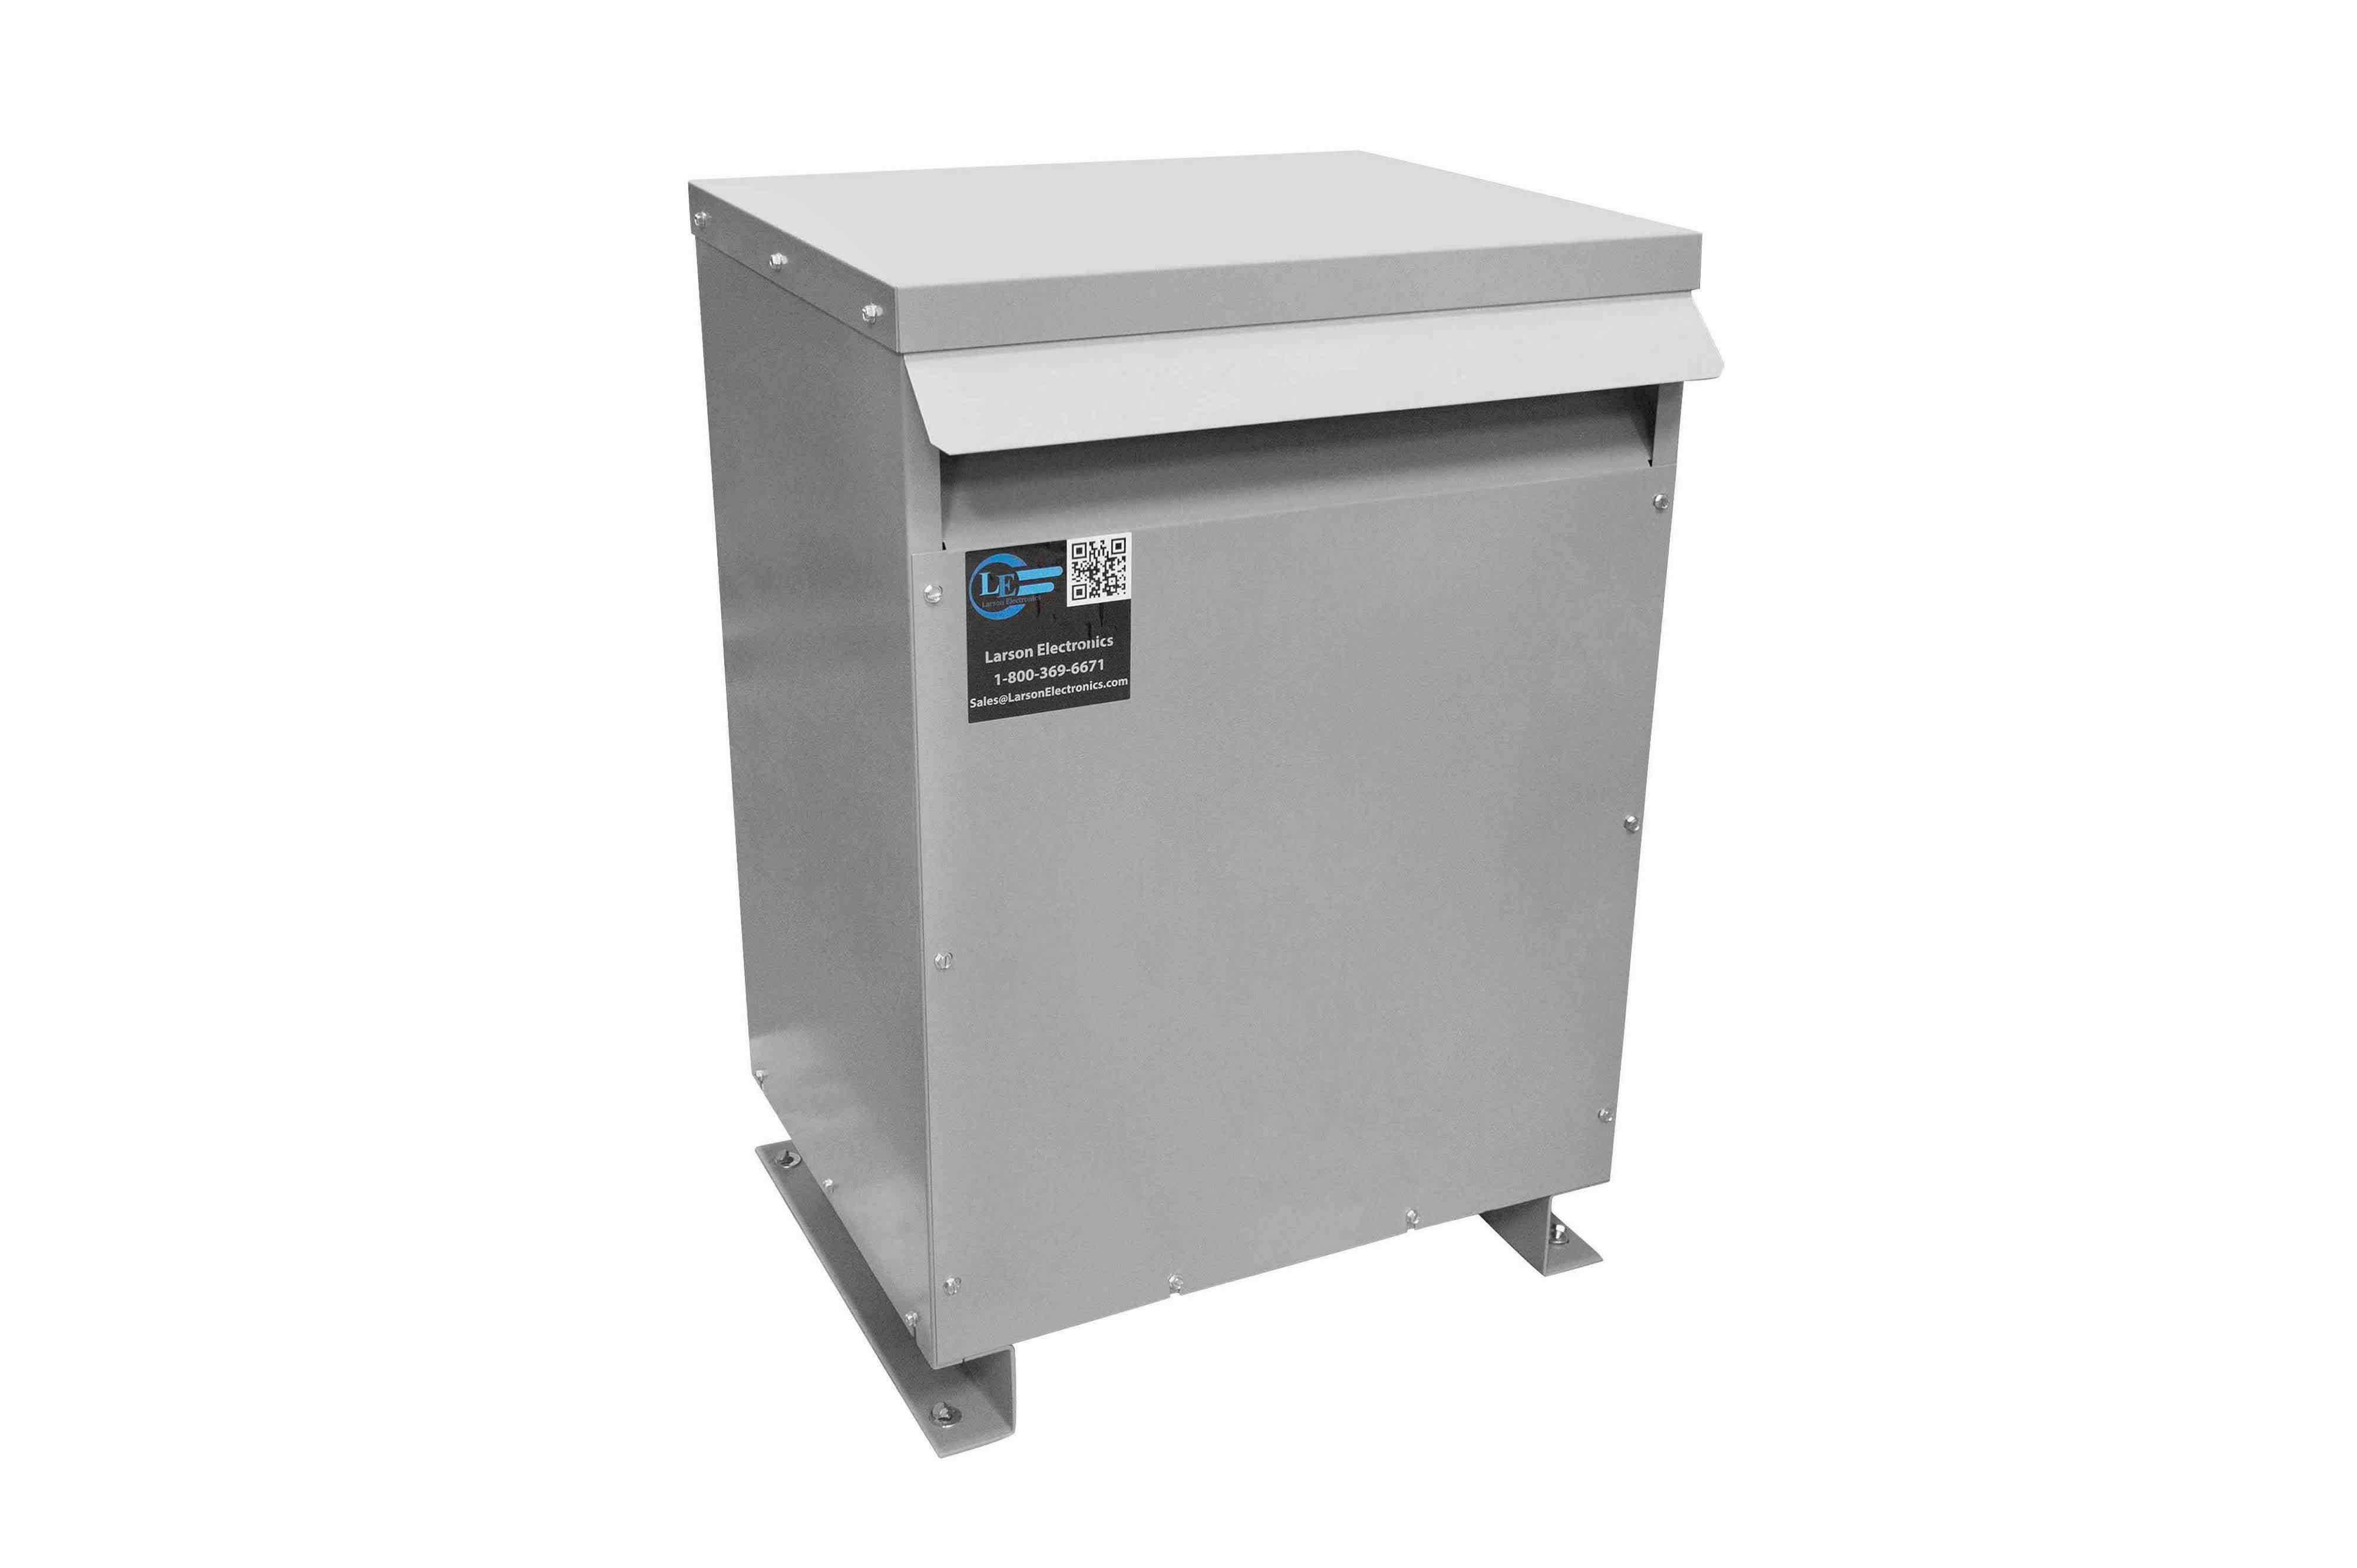 47.5 kVA 3PH Isolation Transformer, 208V Wye Primary, 400V Delta Secondary, N3R, Ventilated, 60 Hz